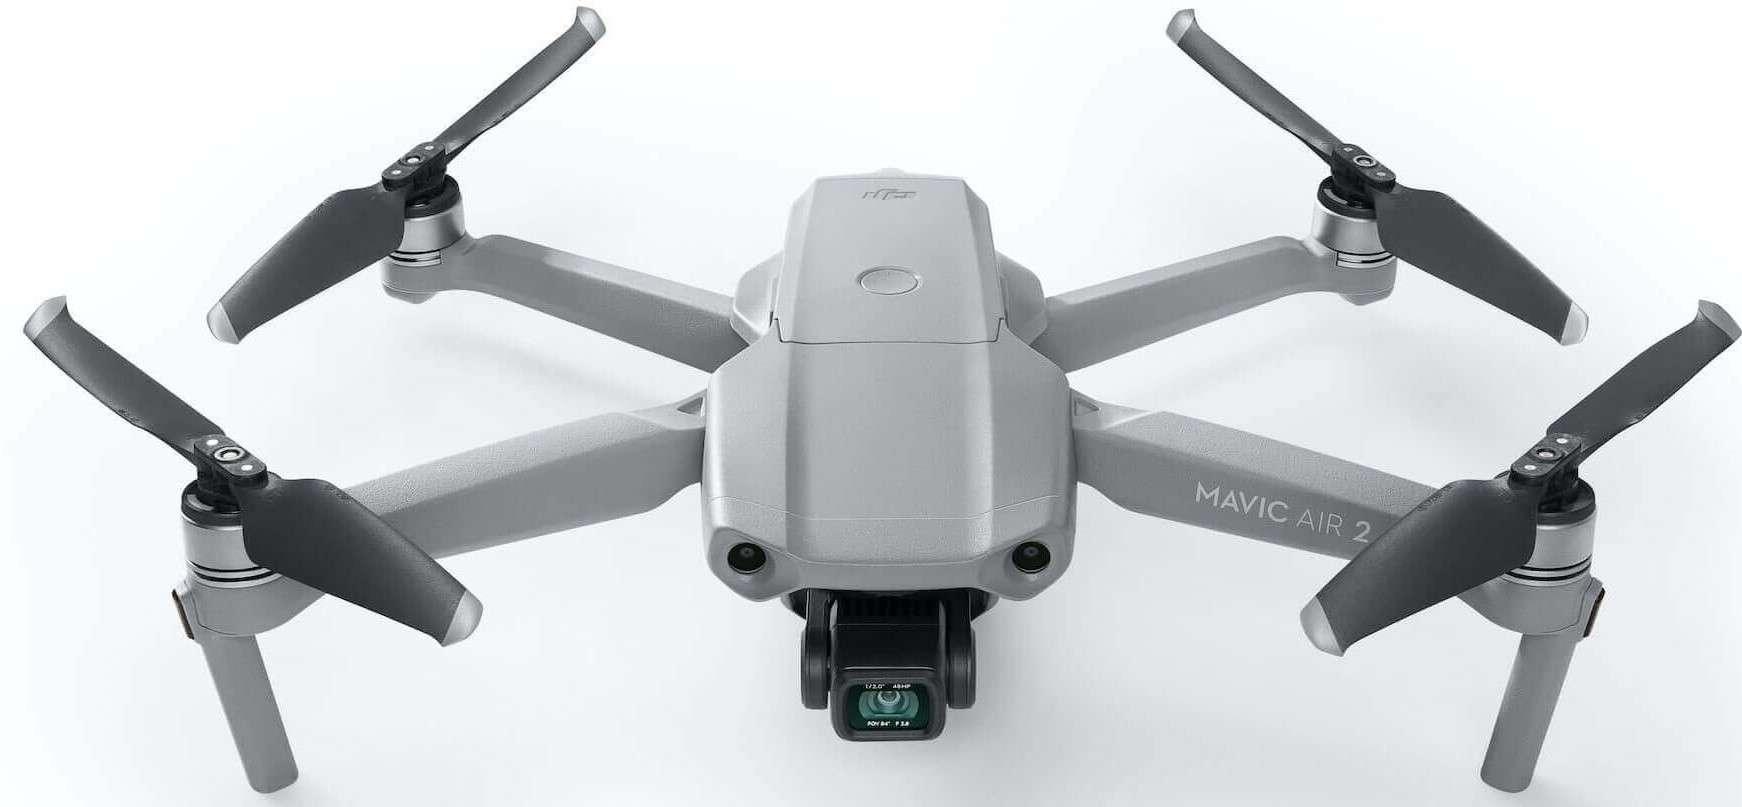 DJI MAVIC AIR 2| DJI MAVIC AIR 2 price in India